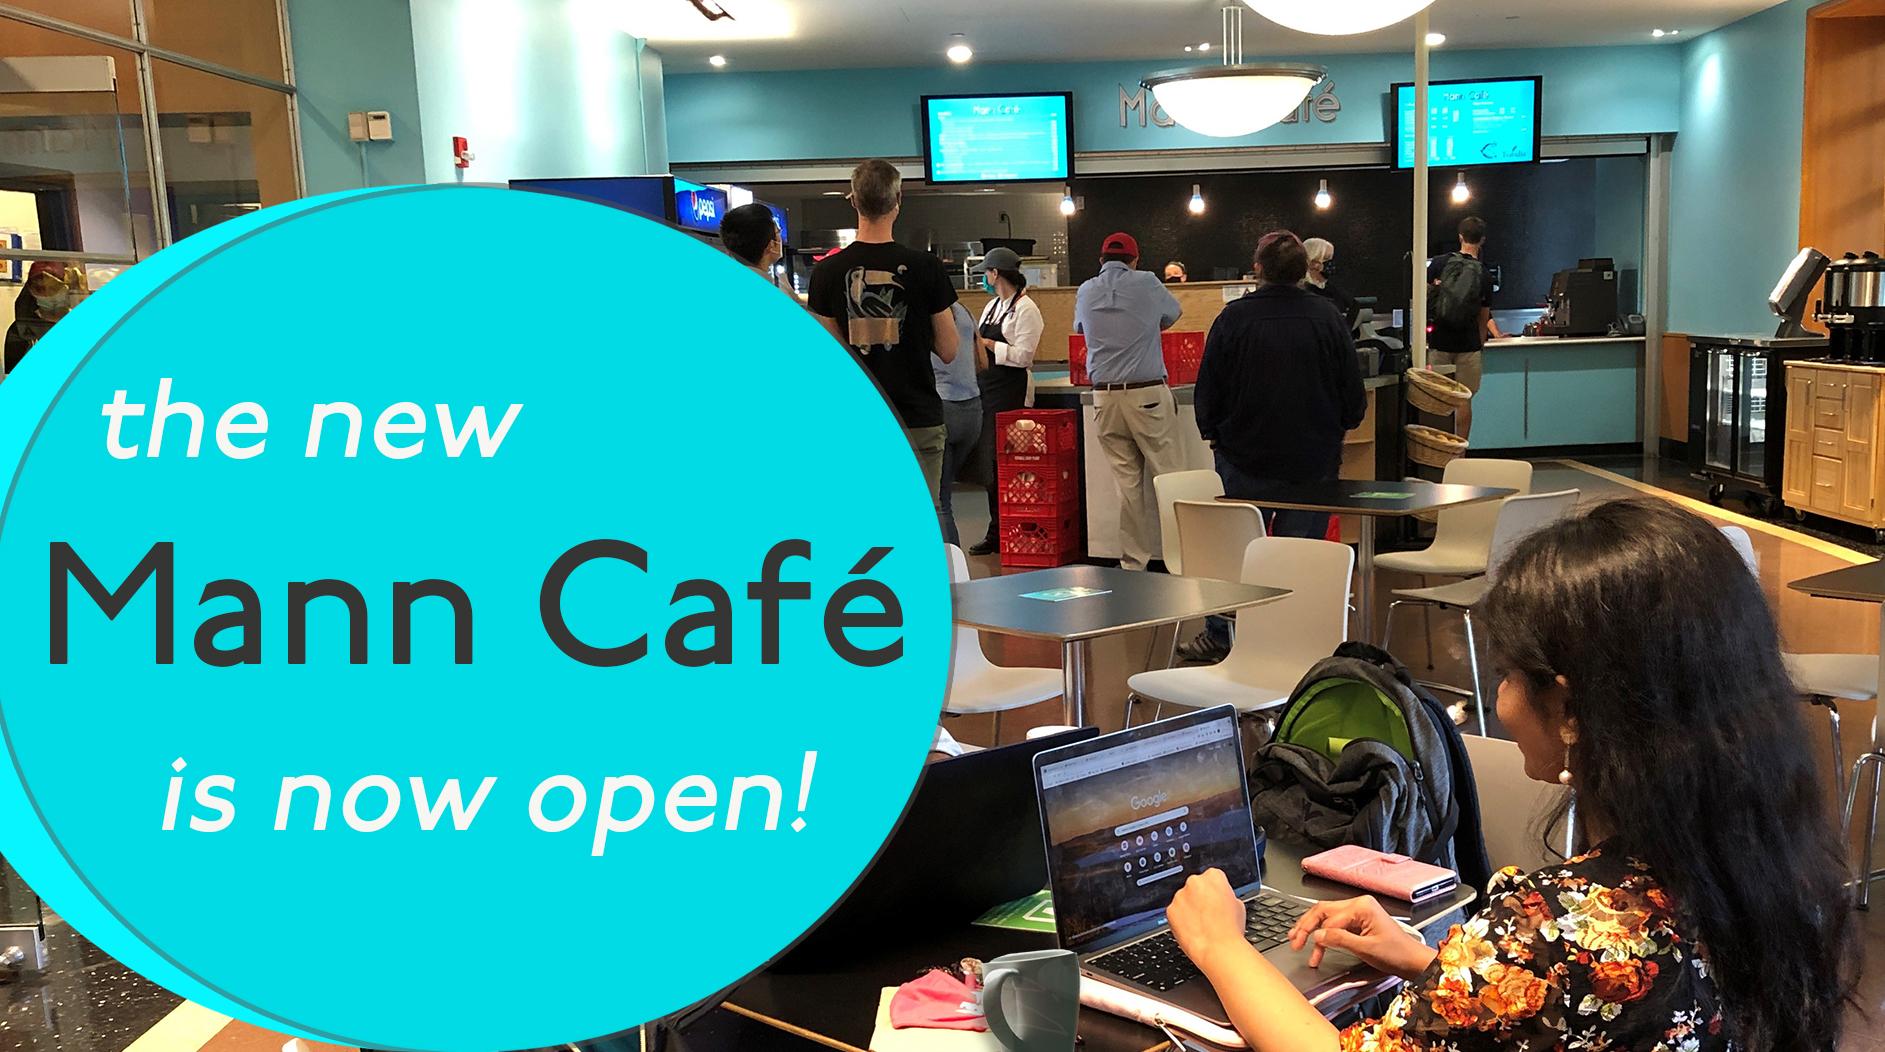 Interior of the new Mann Café